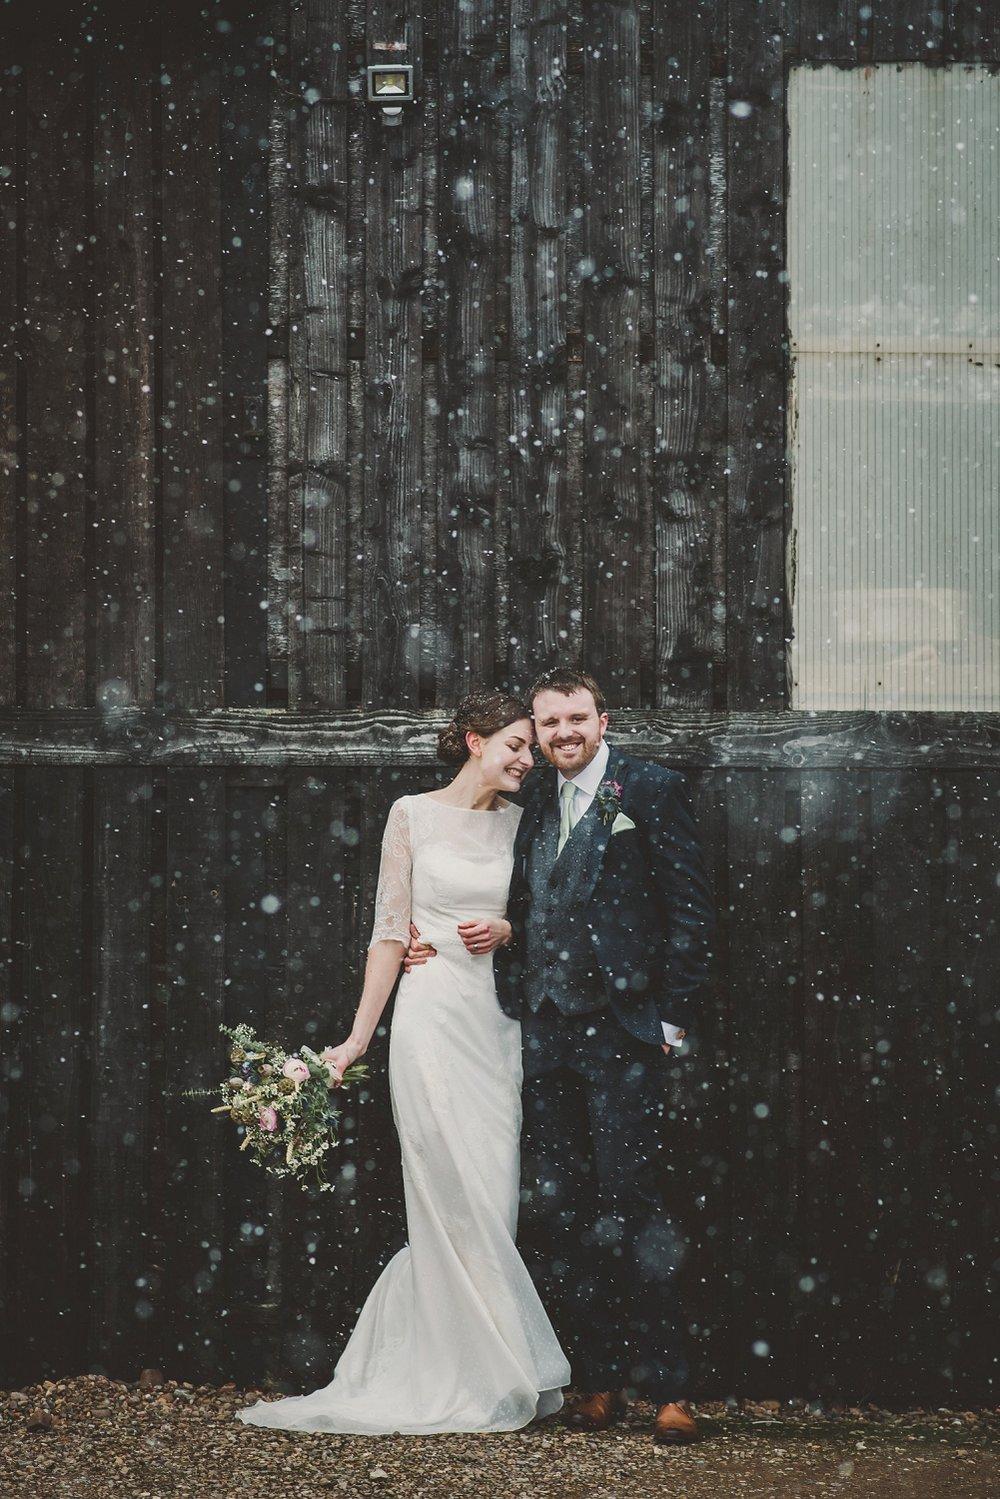 Nick_Sam_Curradine_Wedding_0009.jpg